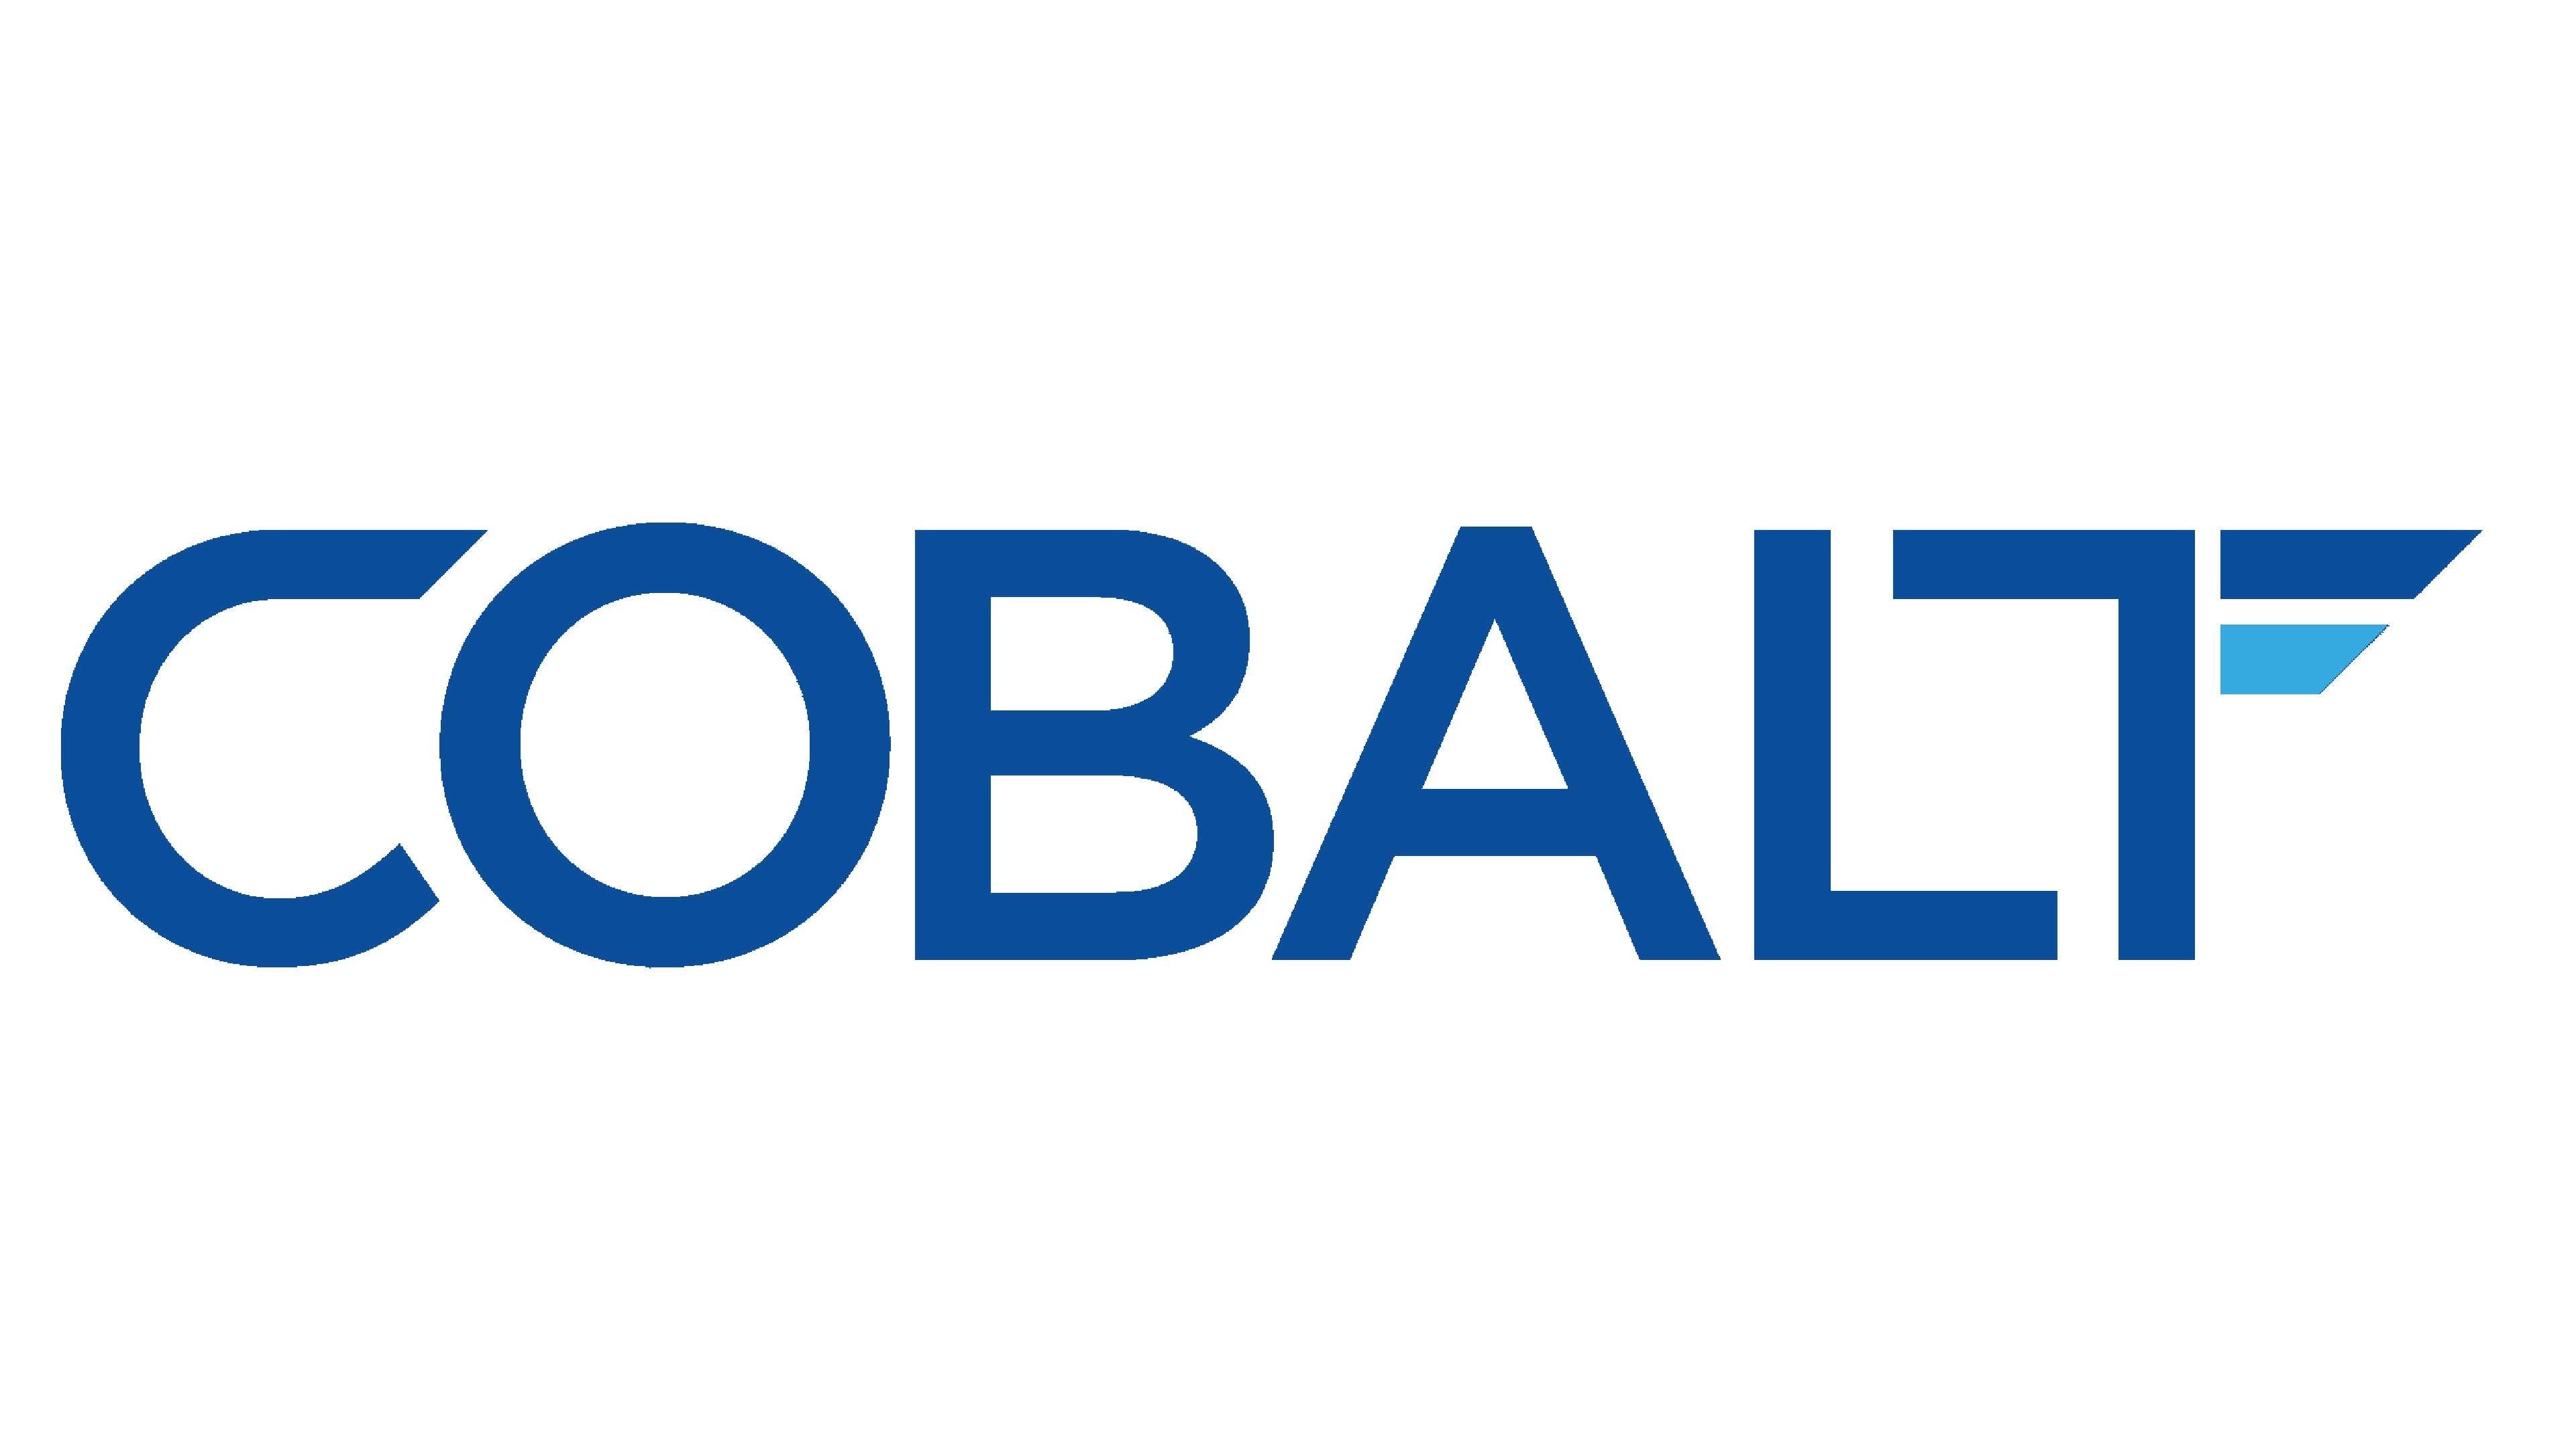 Cobalt Air Logo Logo